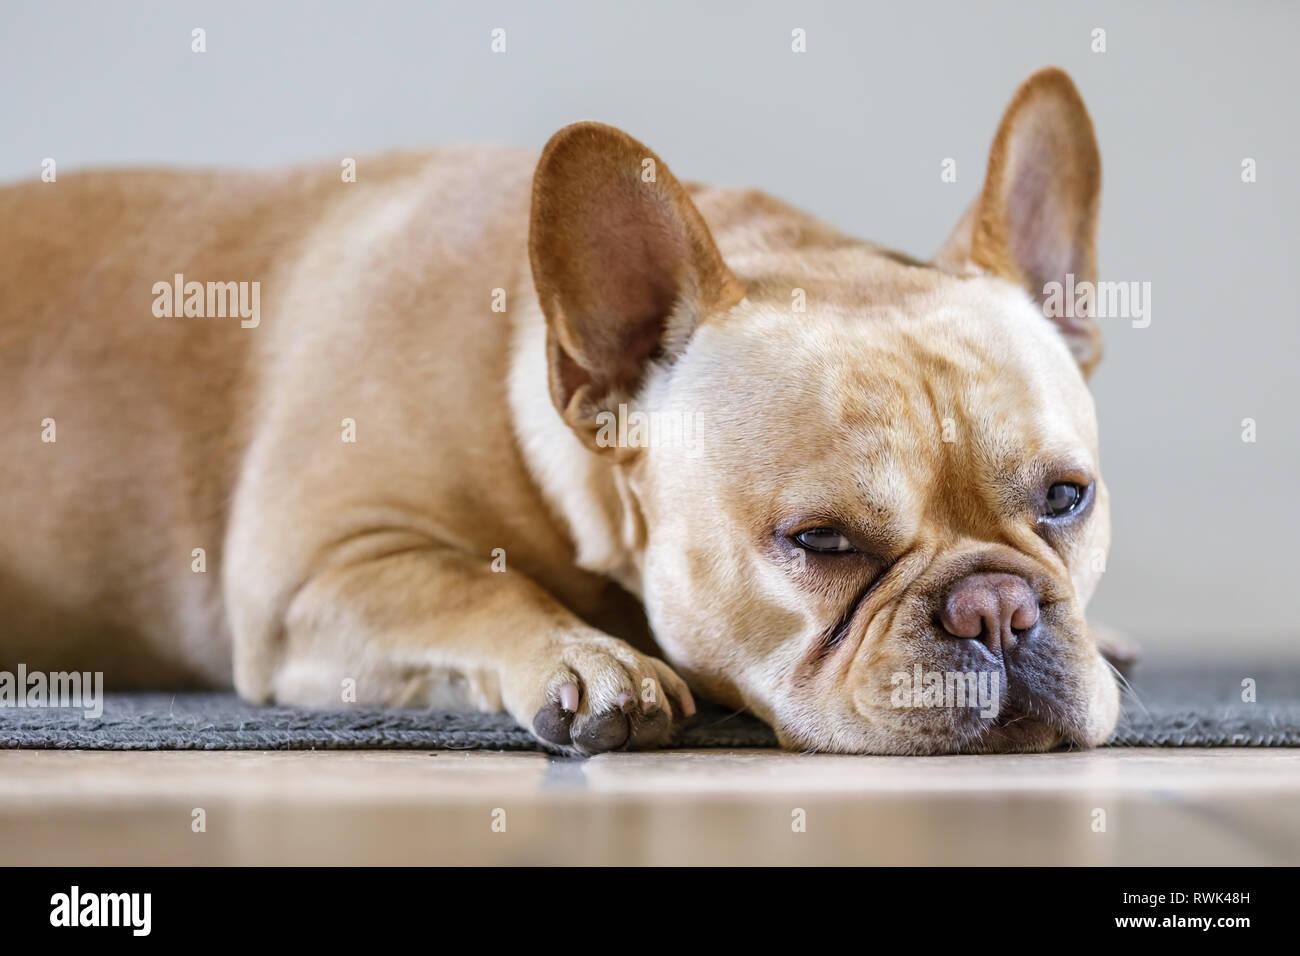 dd86737e6ca1 White Brown French Bulldog Puppy Stock Photos   White Brown French ...